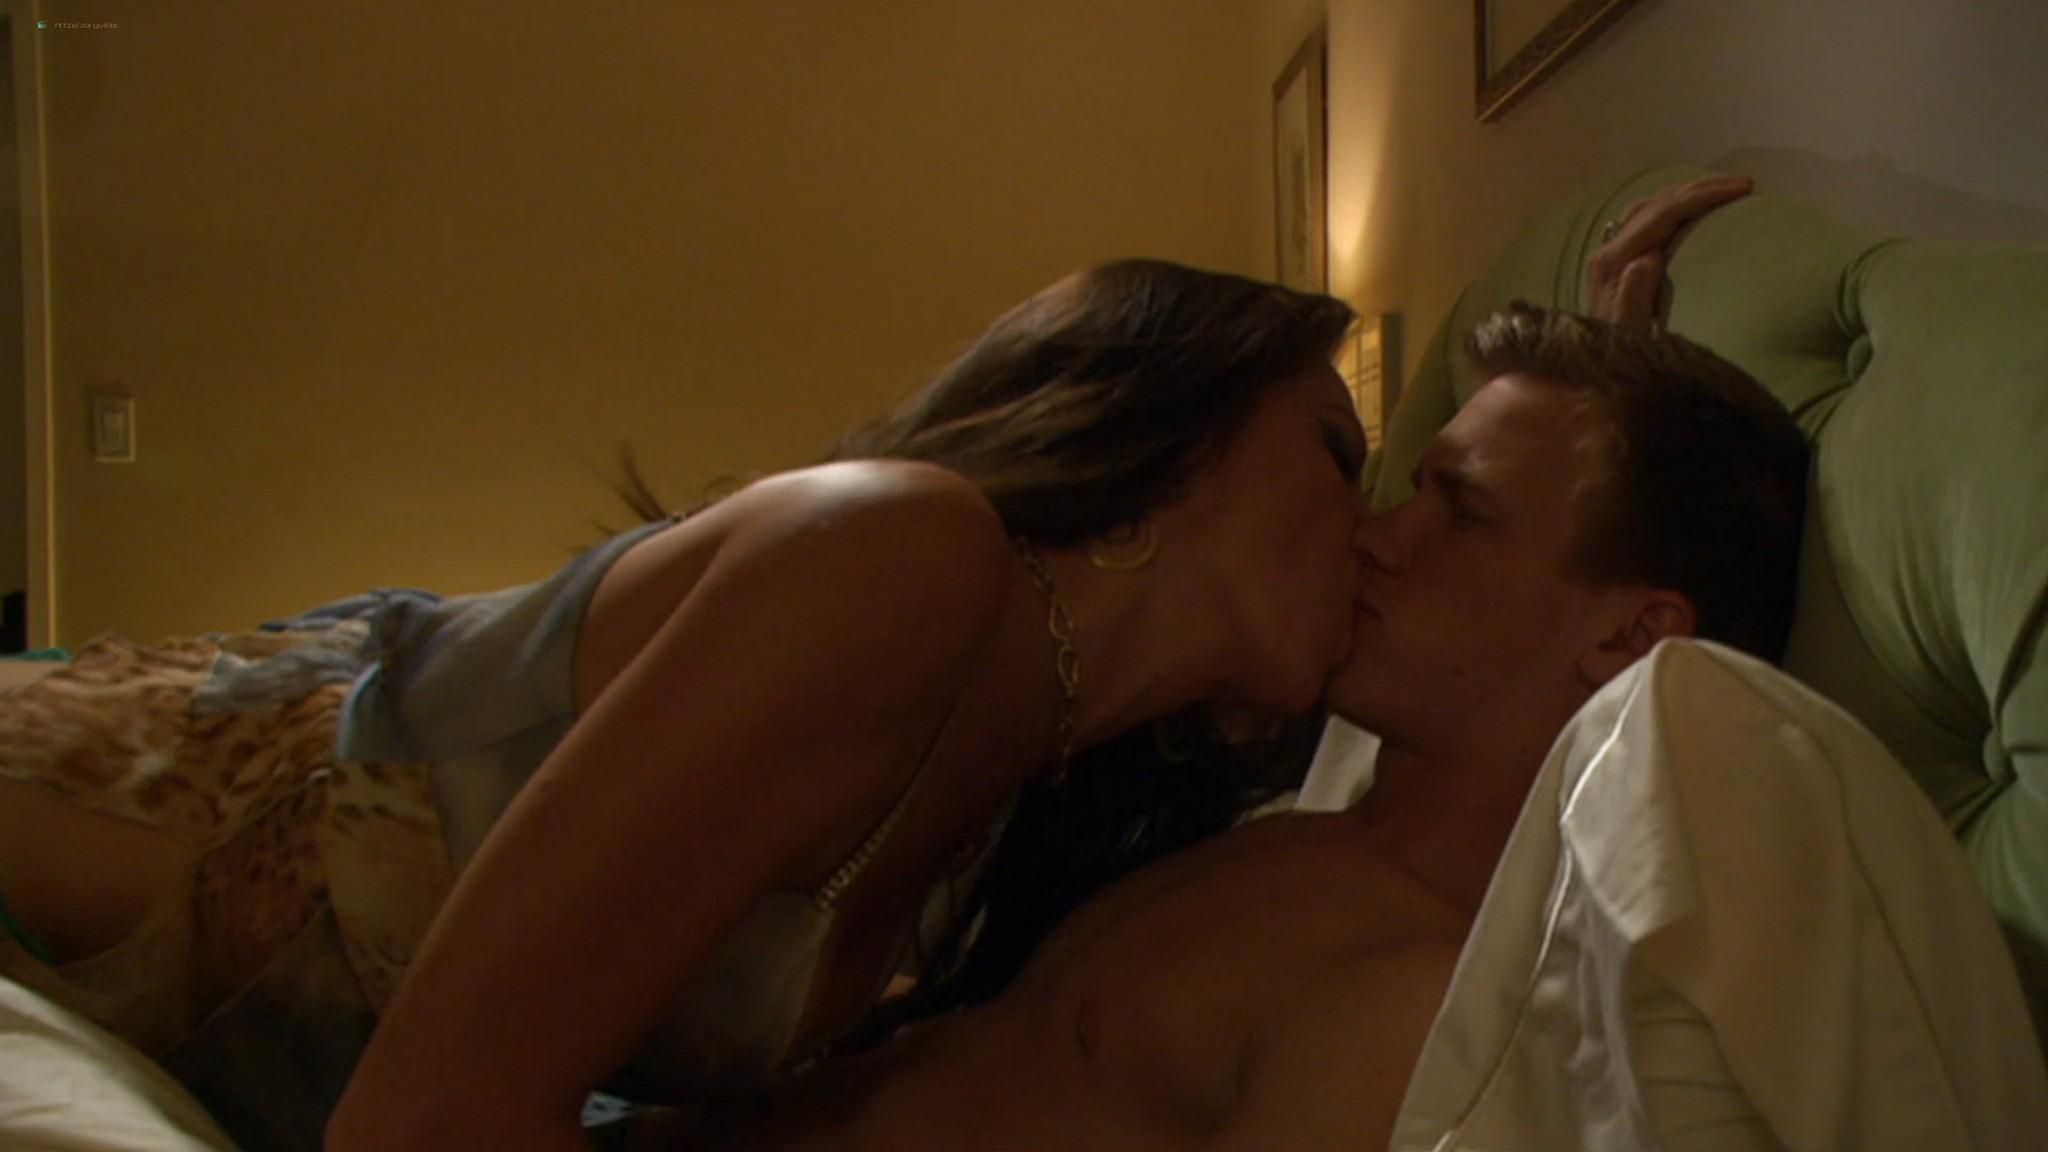 Kaley Cuoco hot Izabella Scorupco sexy others nude - Cougar Club (2007) HD 1080p BluRay (11)